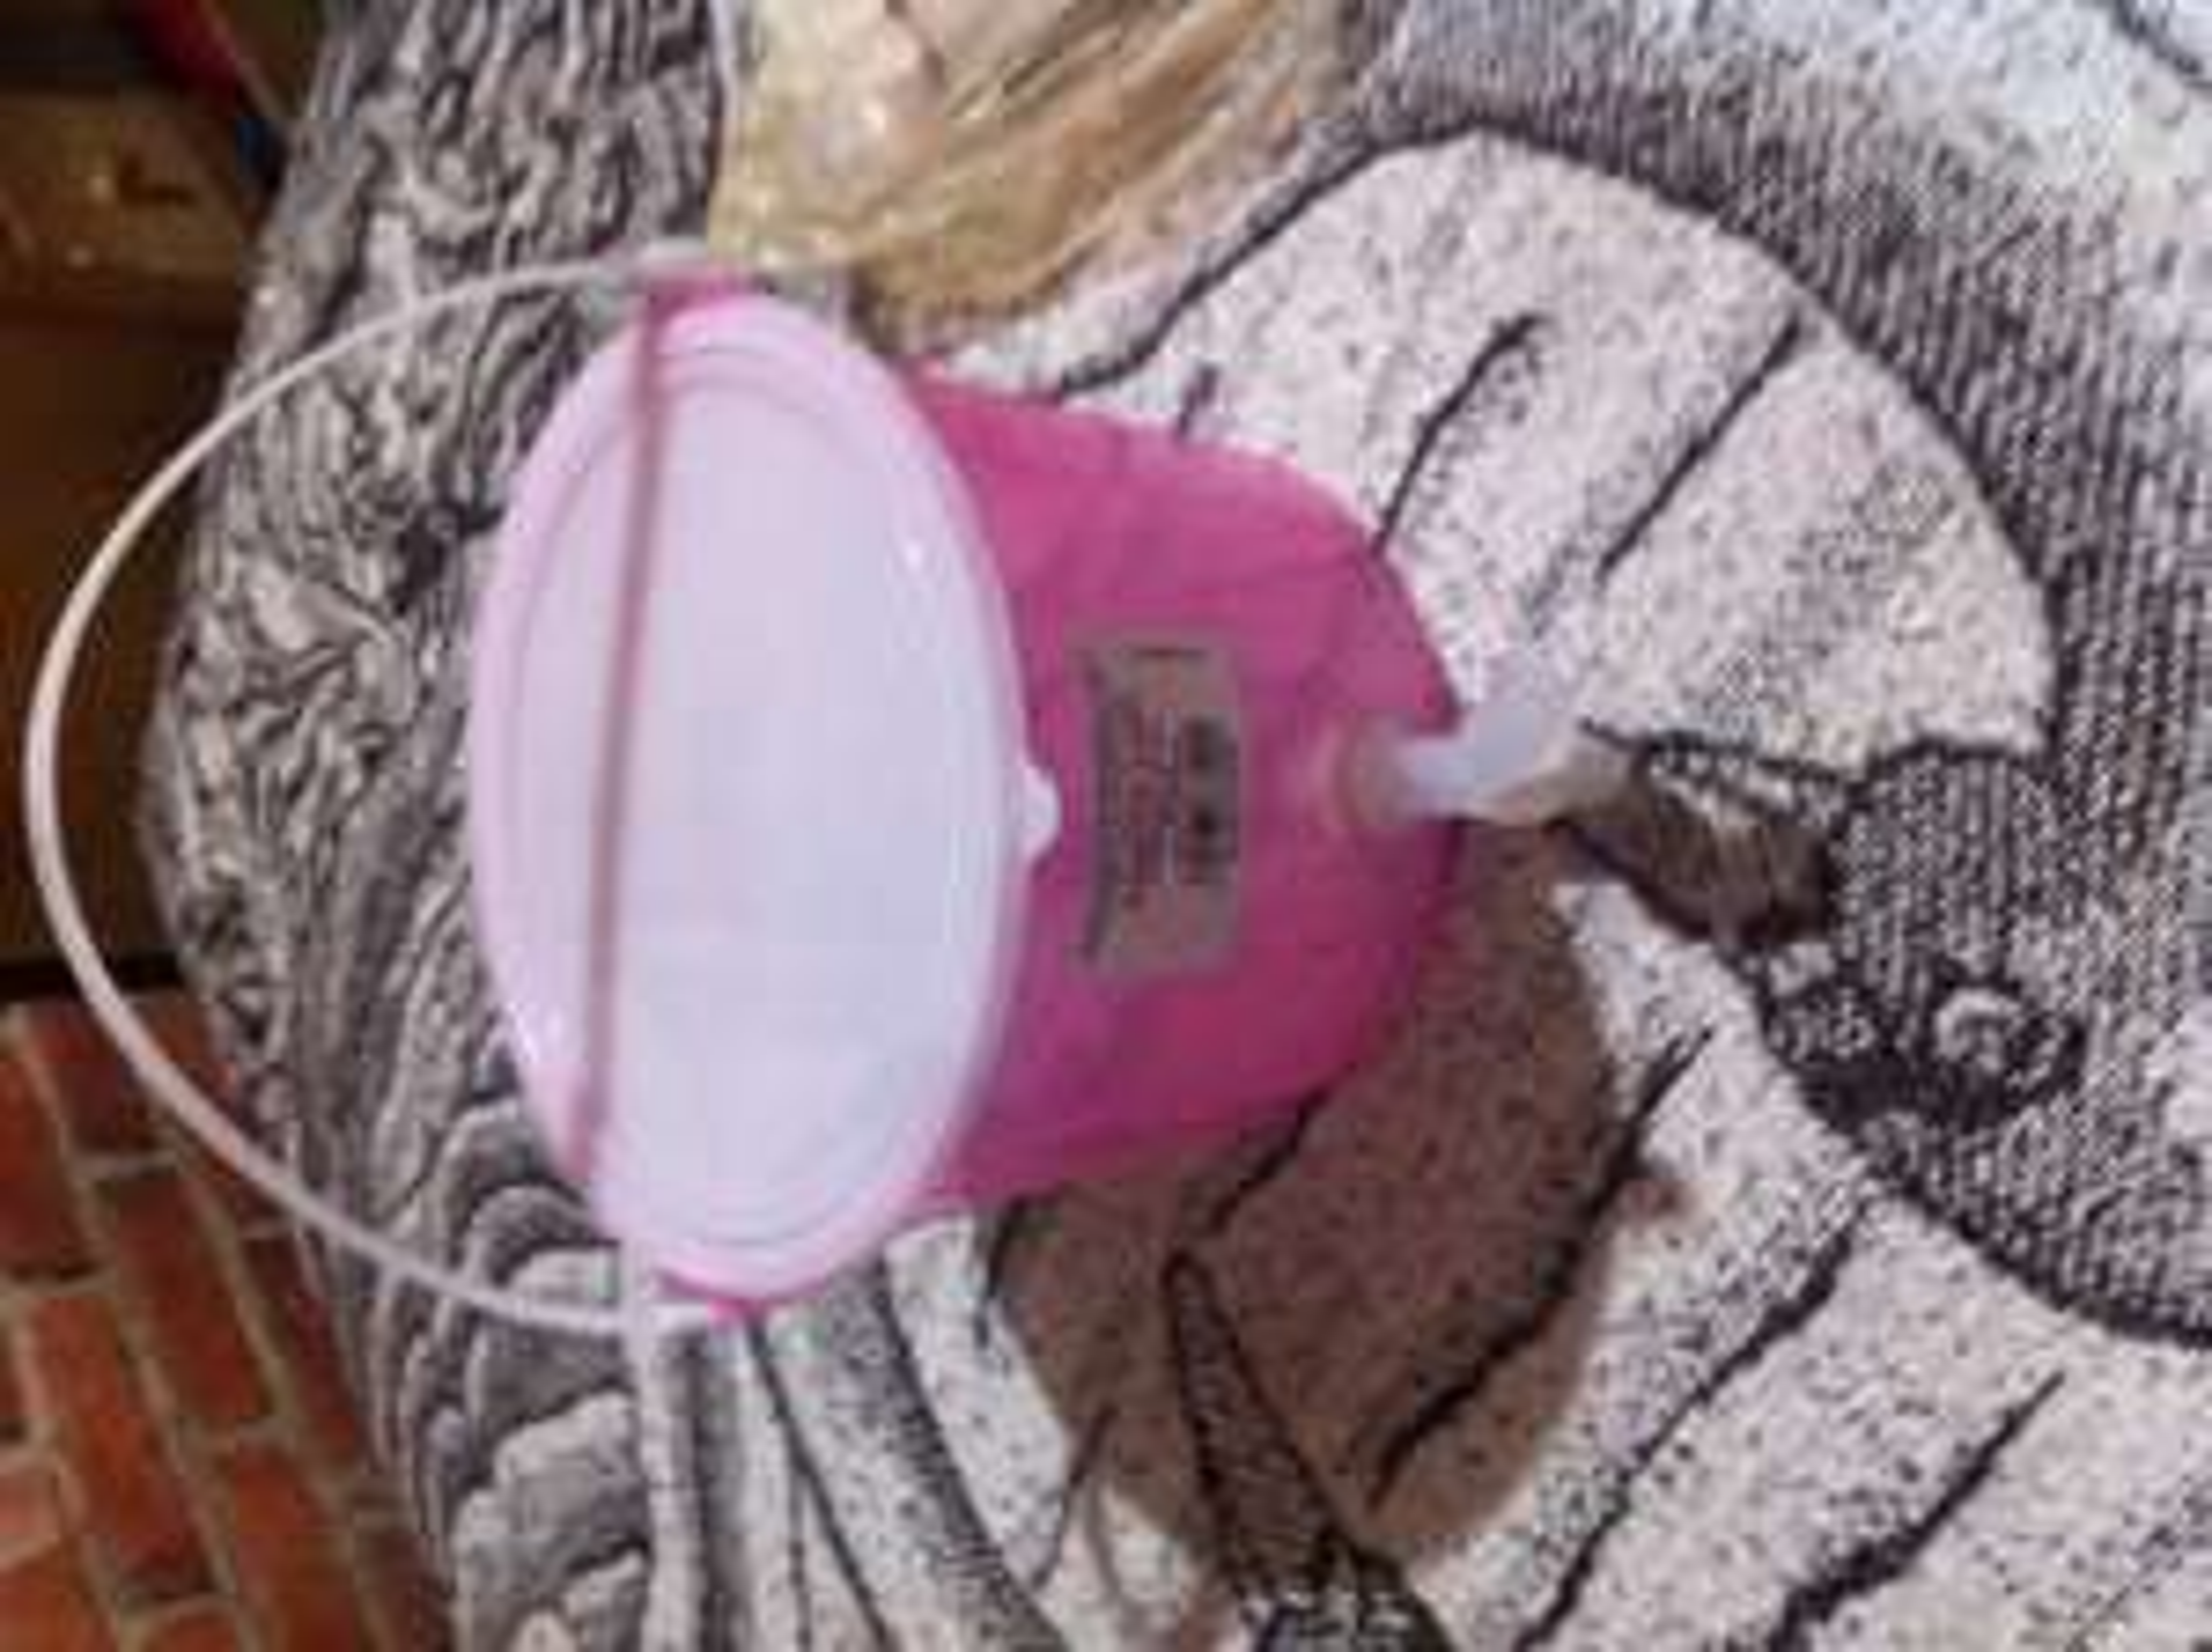 Bodega Aurrerá Las Torres: dispensador de agua rosa a $12.01